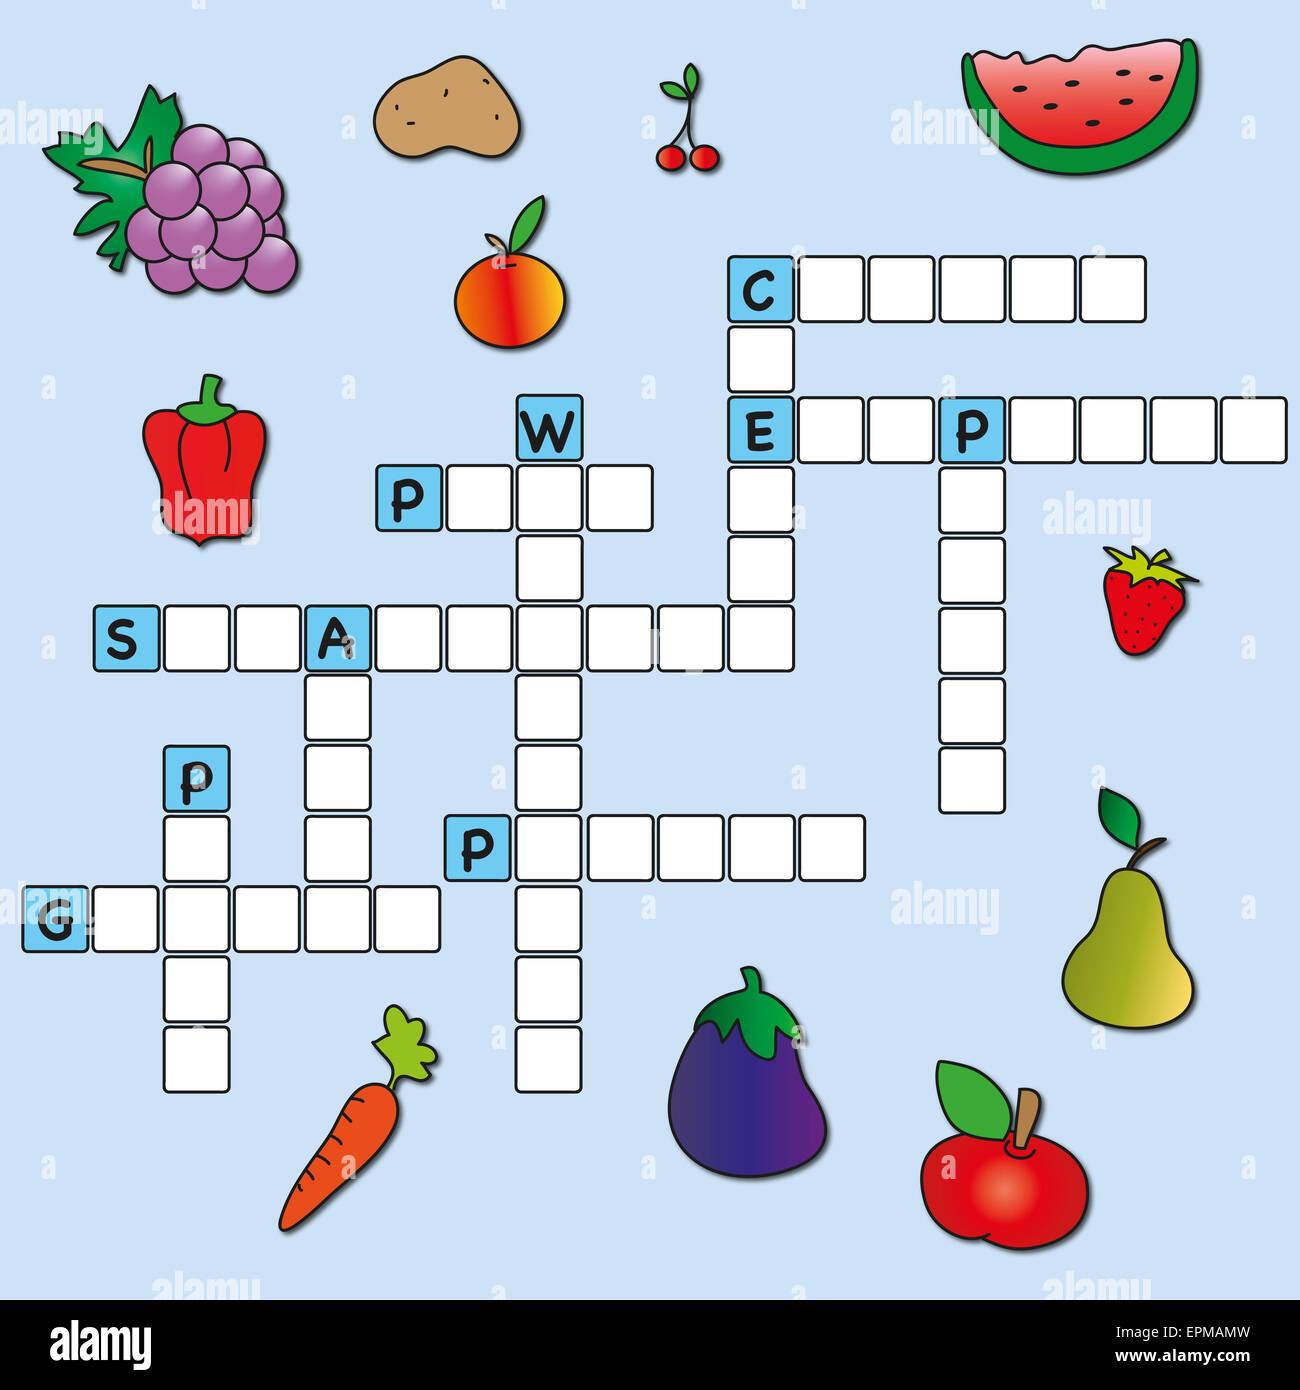 Christmas Crossword Puzzle Bogglesworld